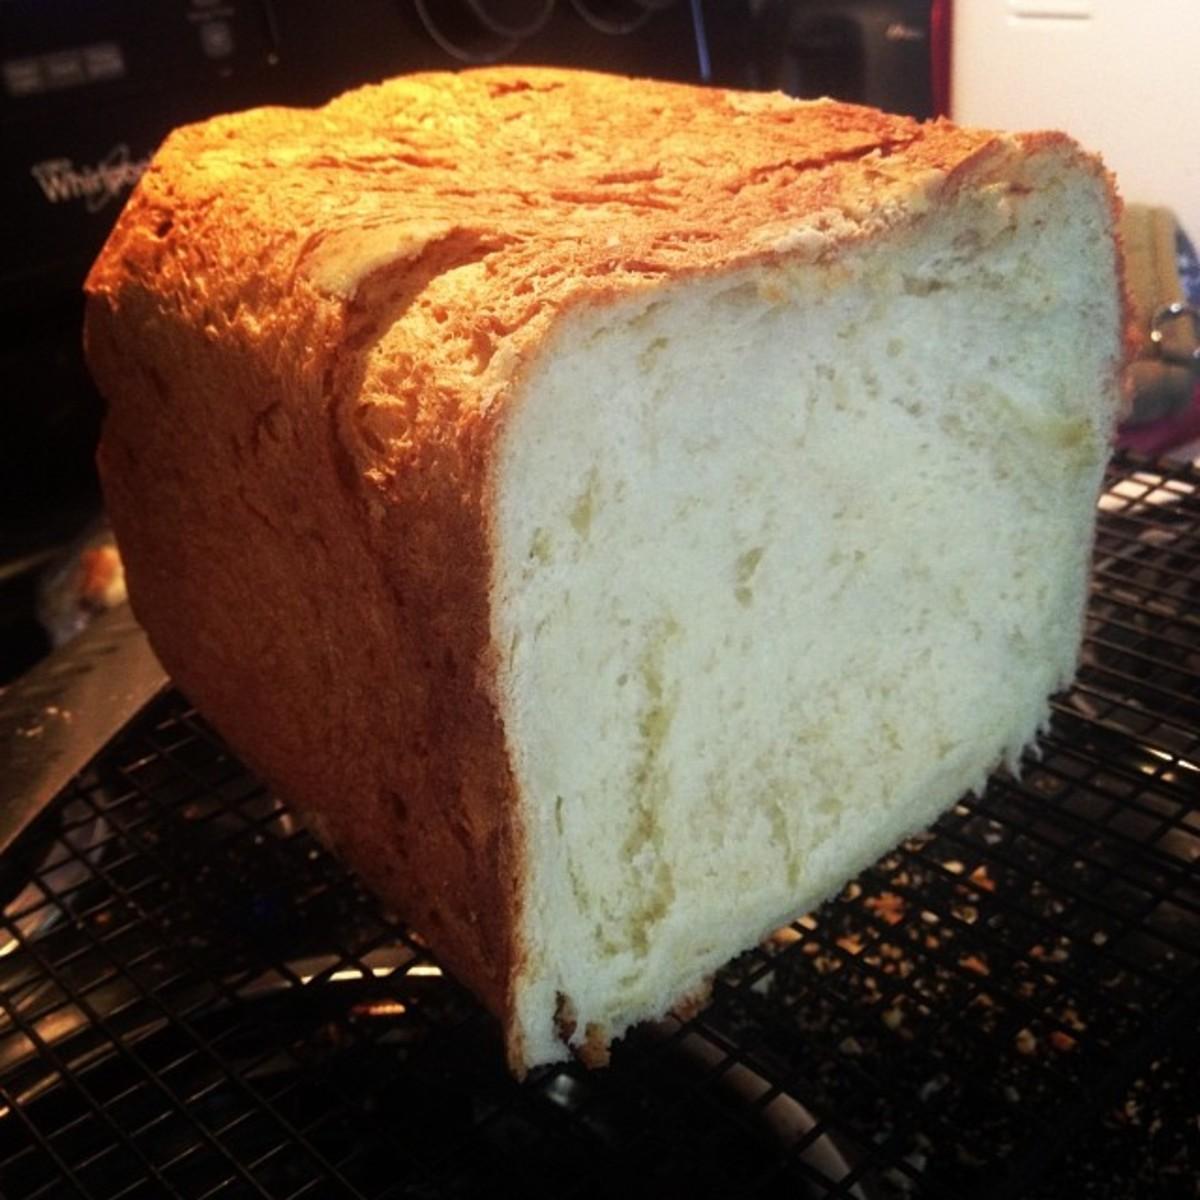 How to Make Gluten-Free Bread in a Bread Machine